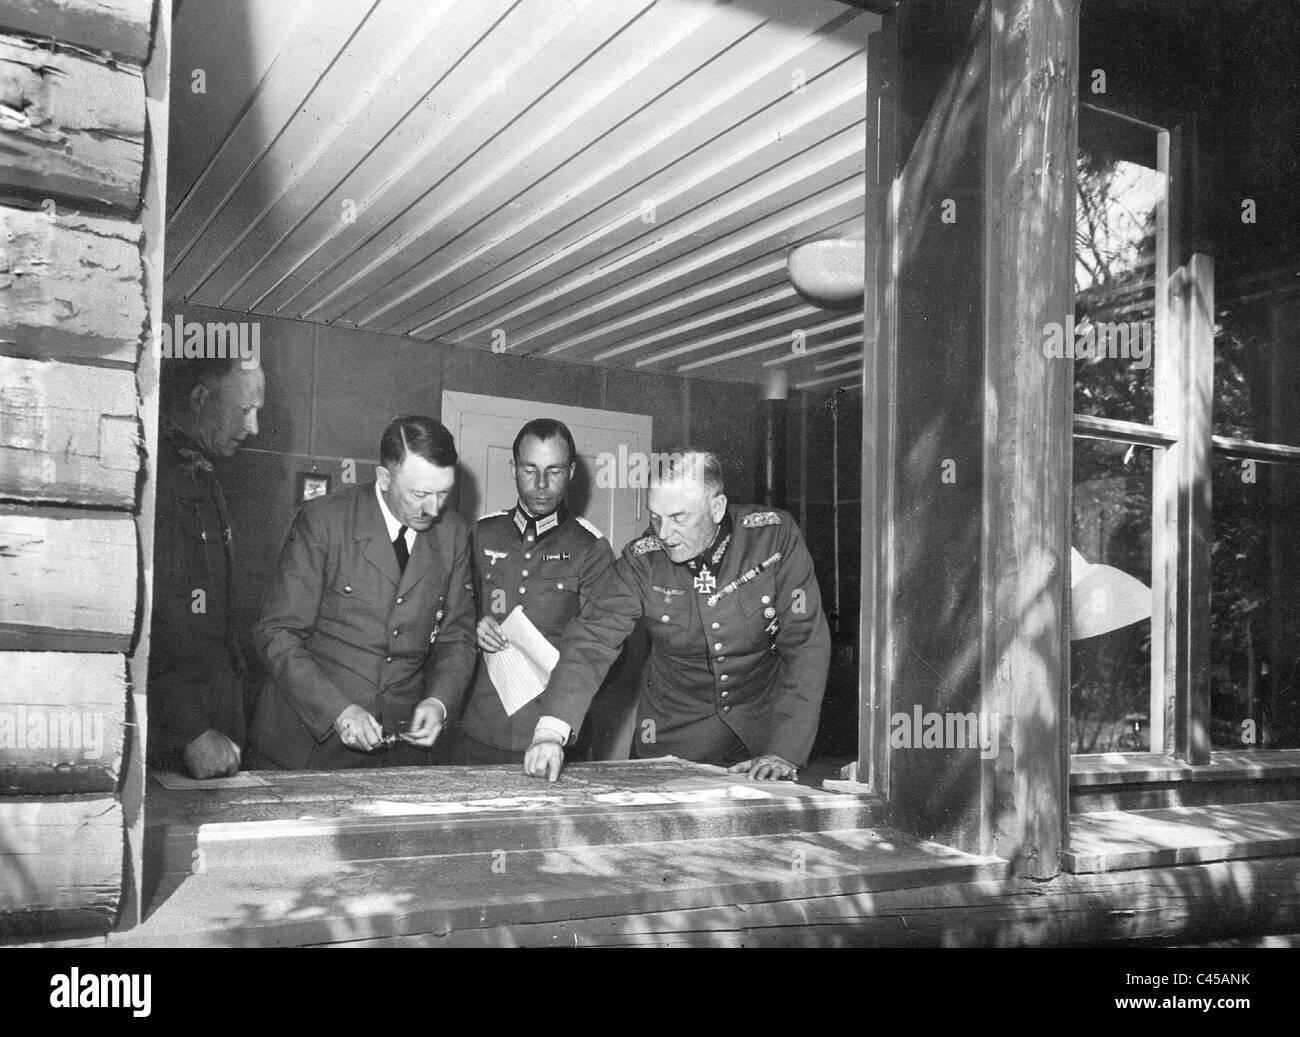 Alfred Jodl, Adolf Hitler und Wilhelm Keitel at the map table, 1940 - Stock Image